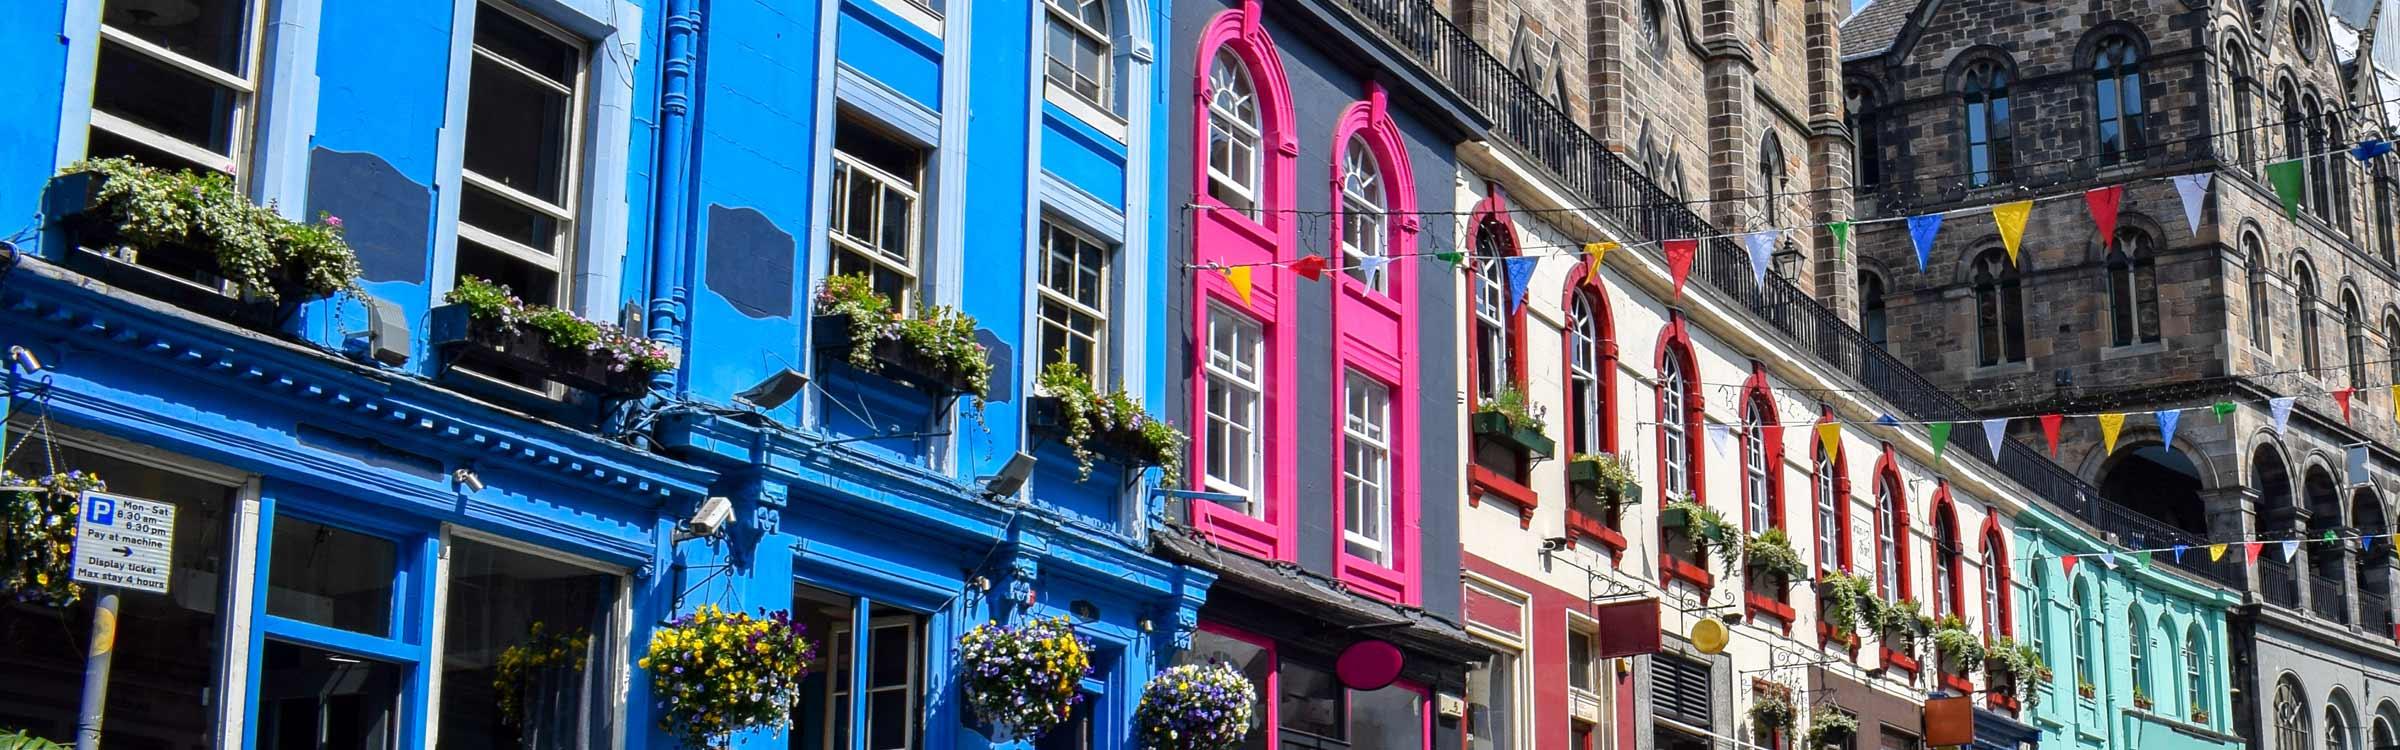 Colourful buildings on Victoria Street in Edinburgh